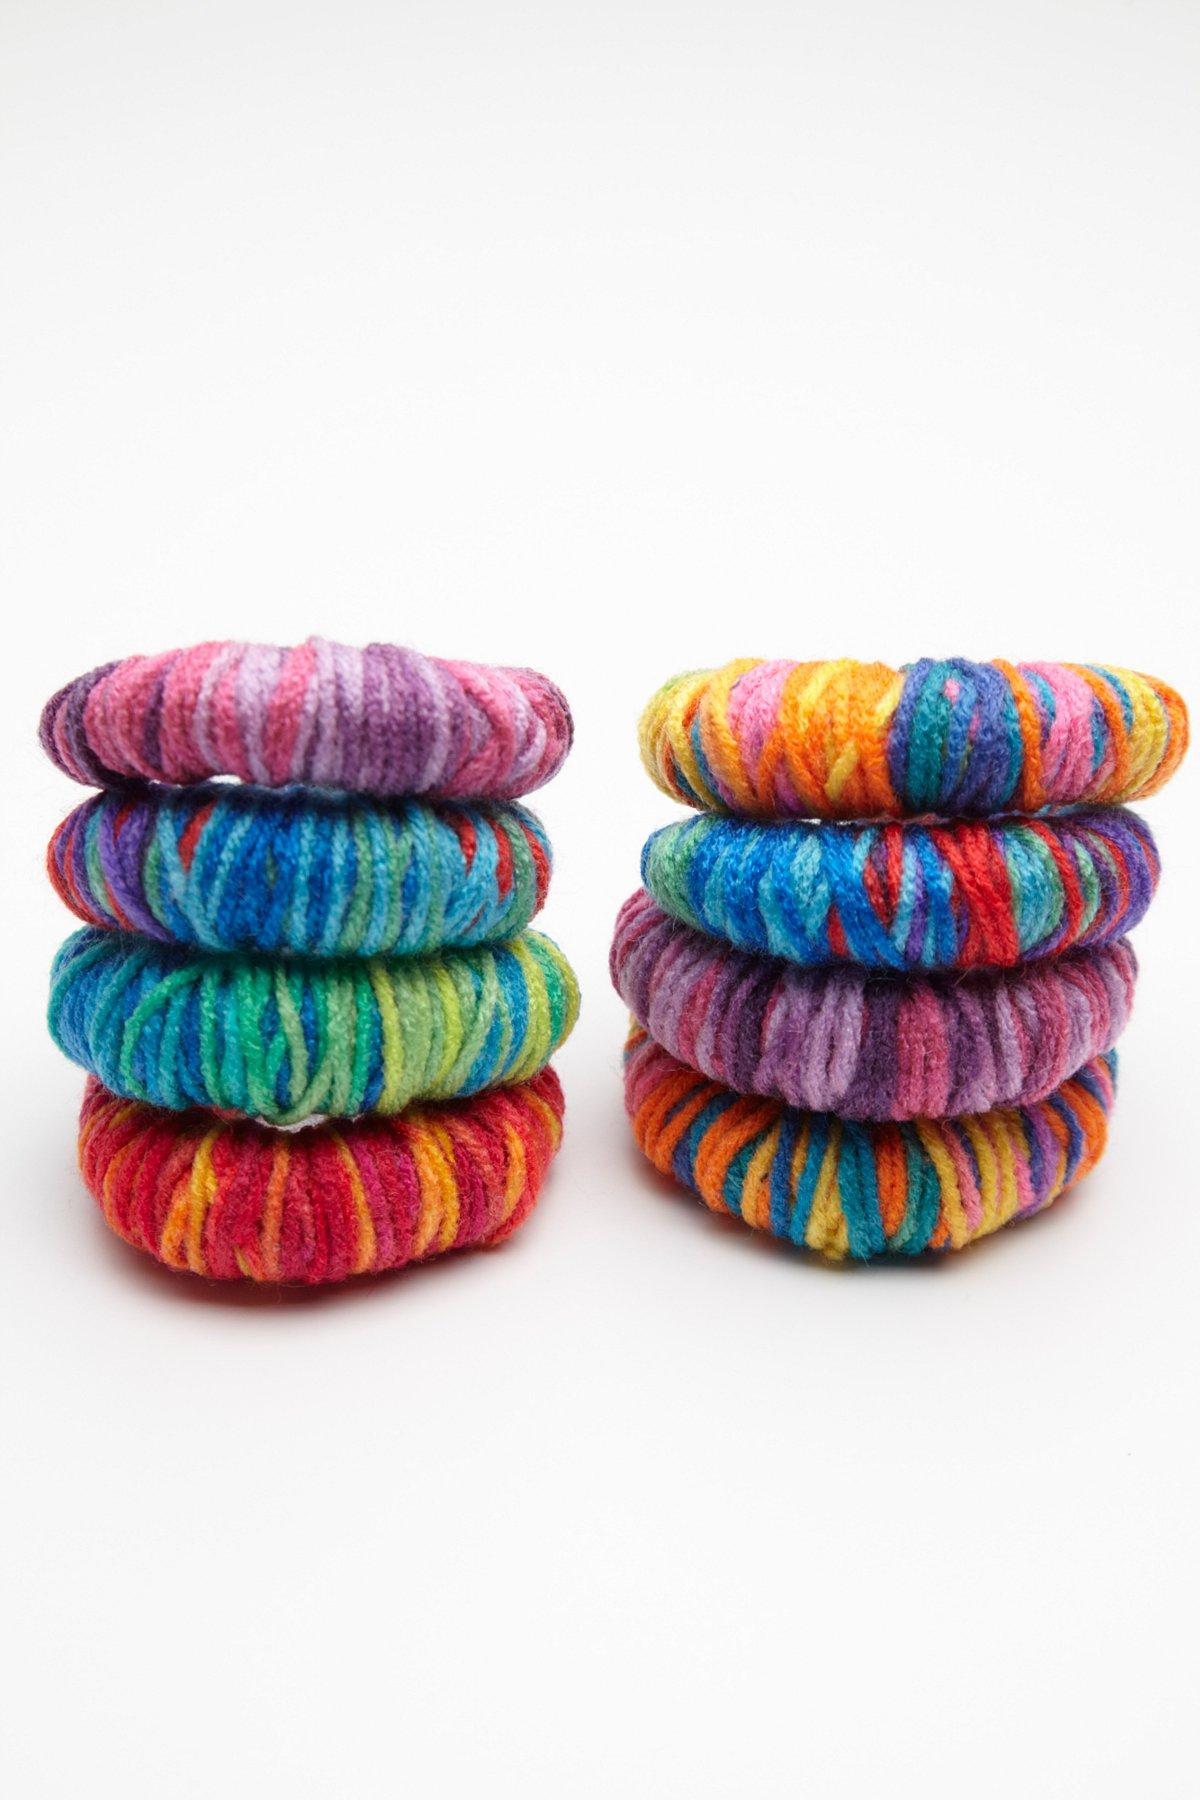 Hair Yarn Rollers